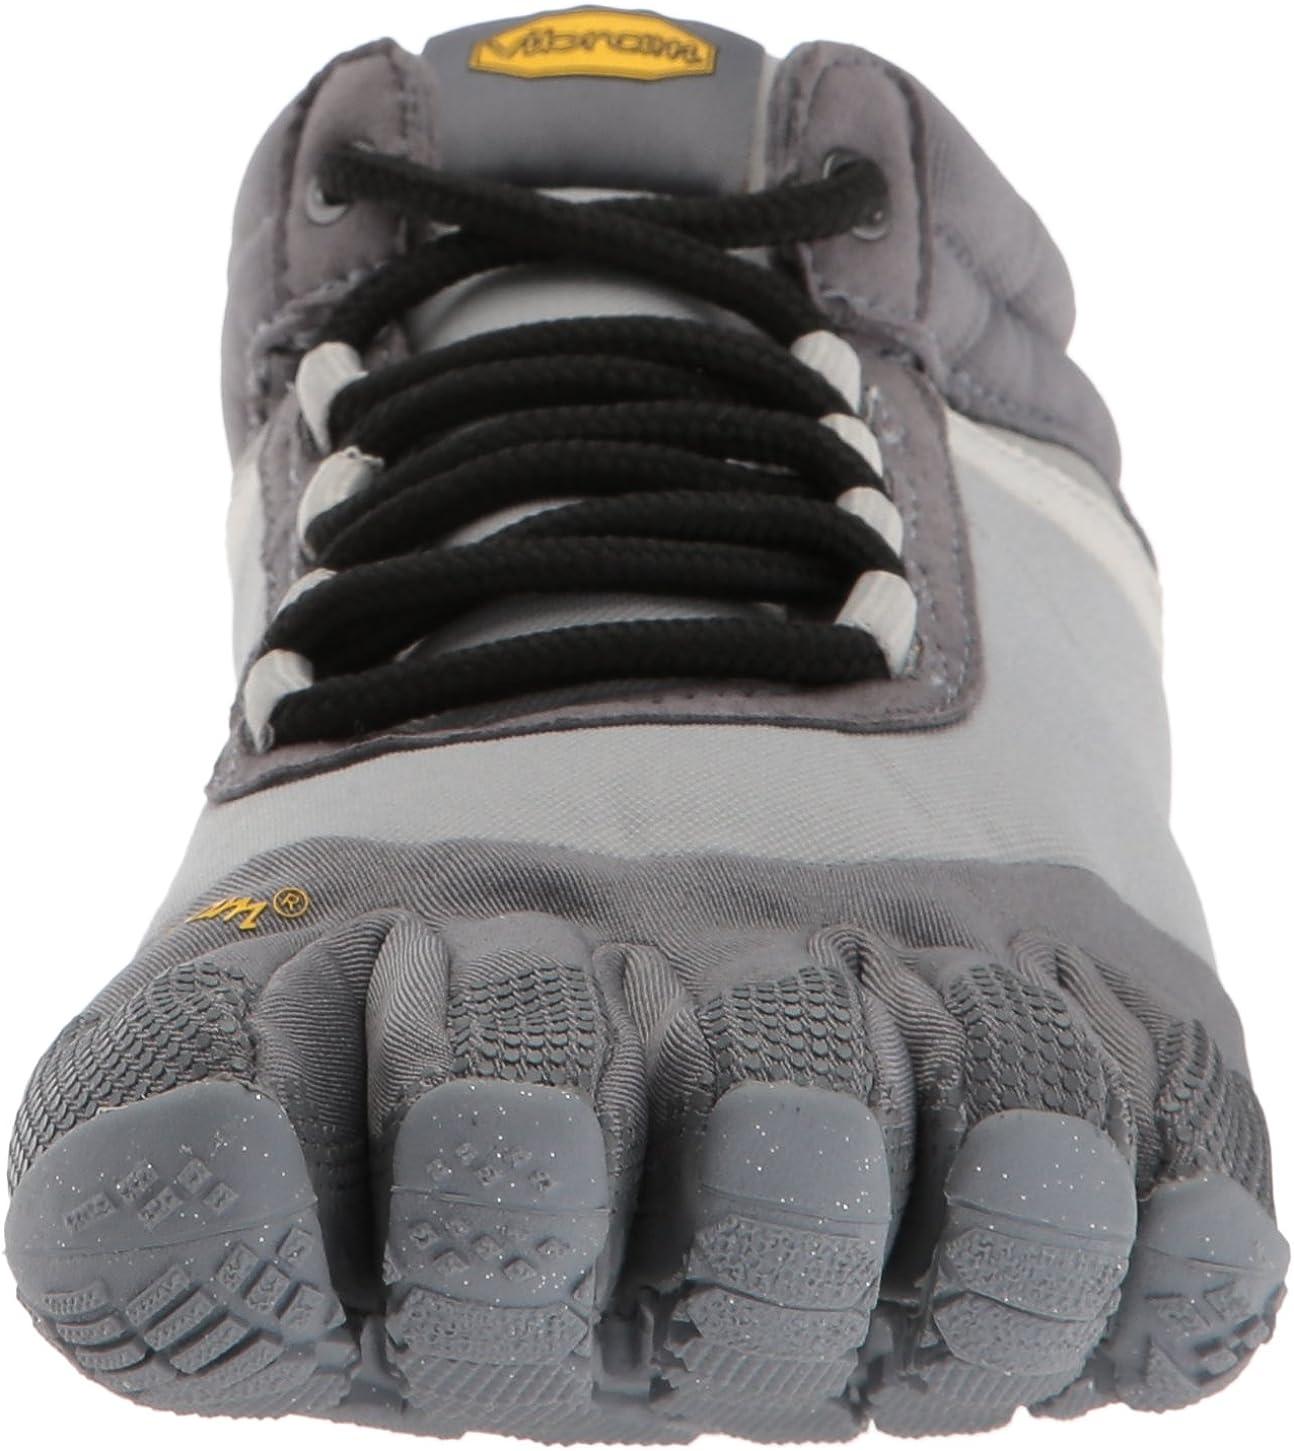 Vibram Womens Trek Ascent Insulated Grey Hiking Shoe